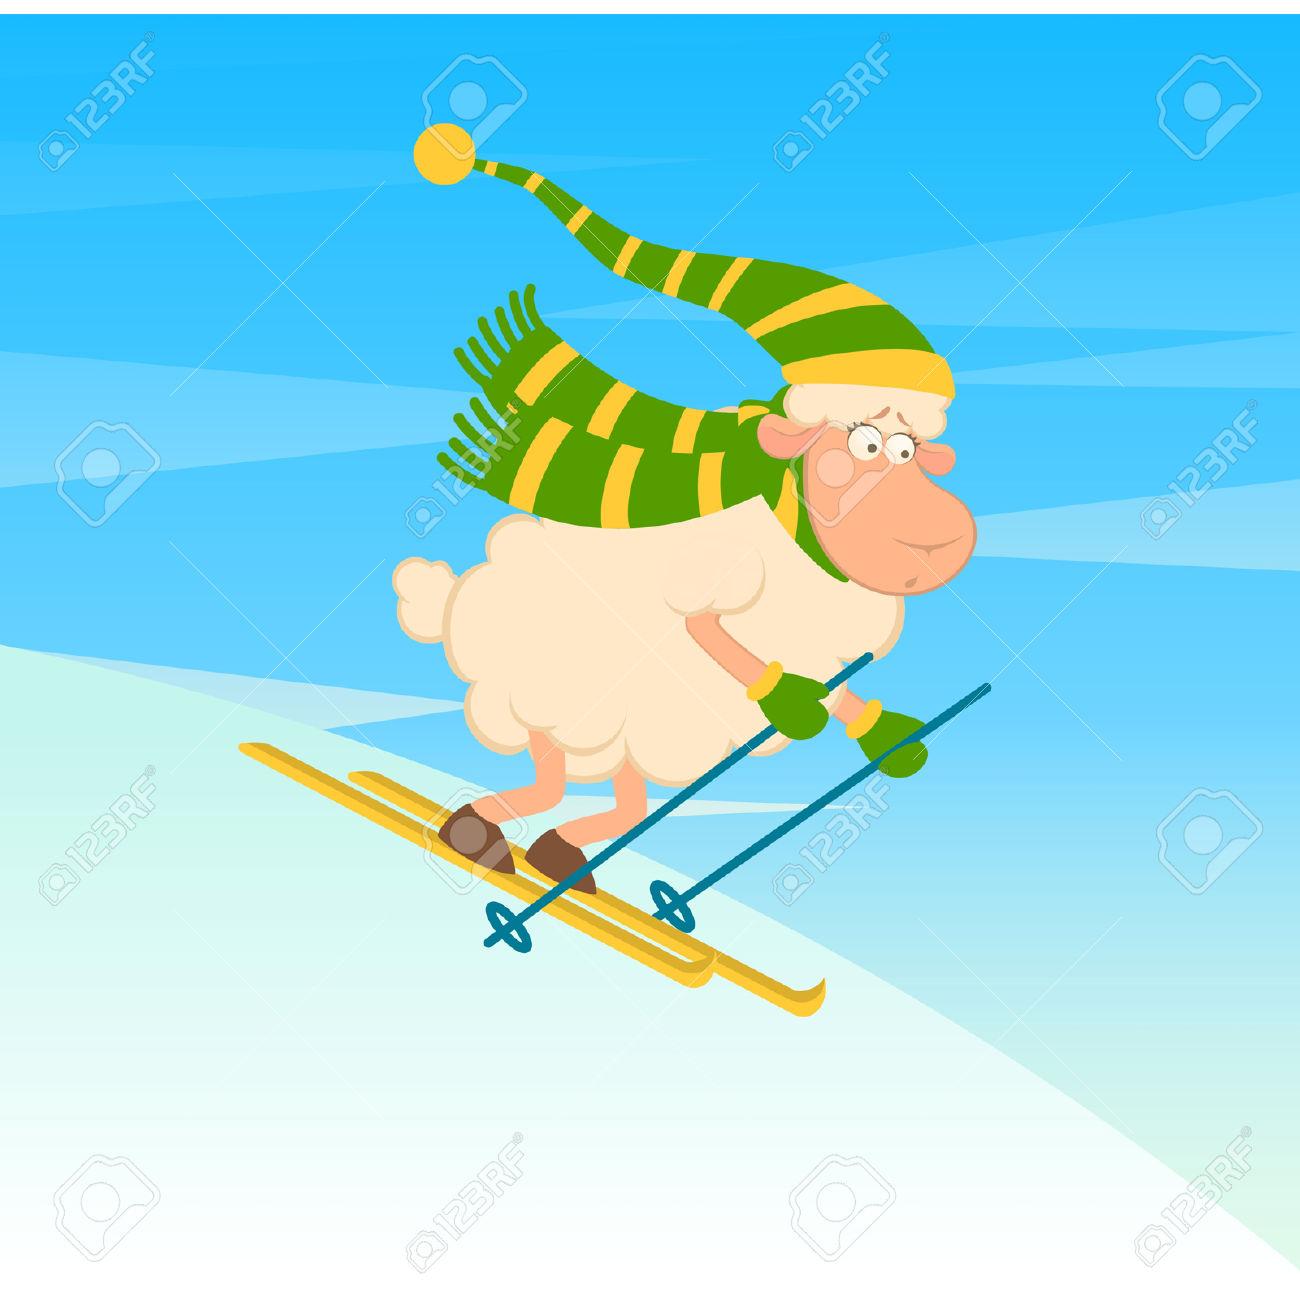 Cartoon Funny Skier Sheep Royalty Free Cliparts, Vectors, And.